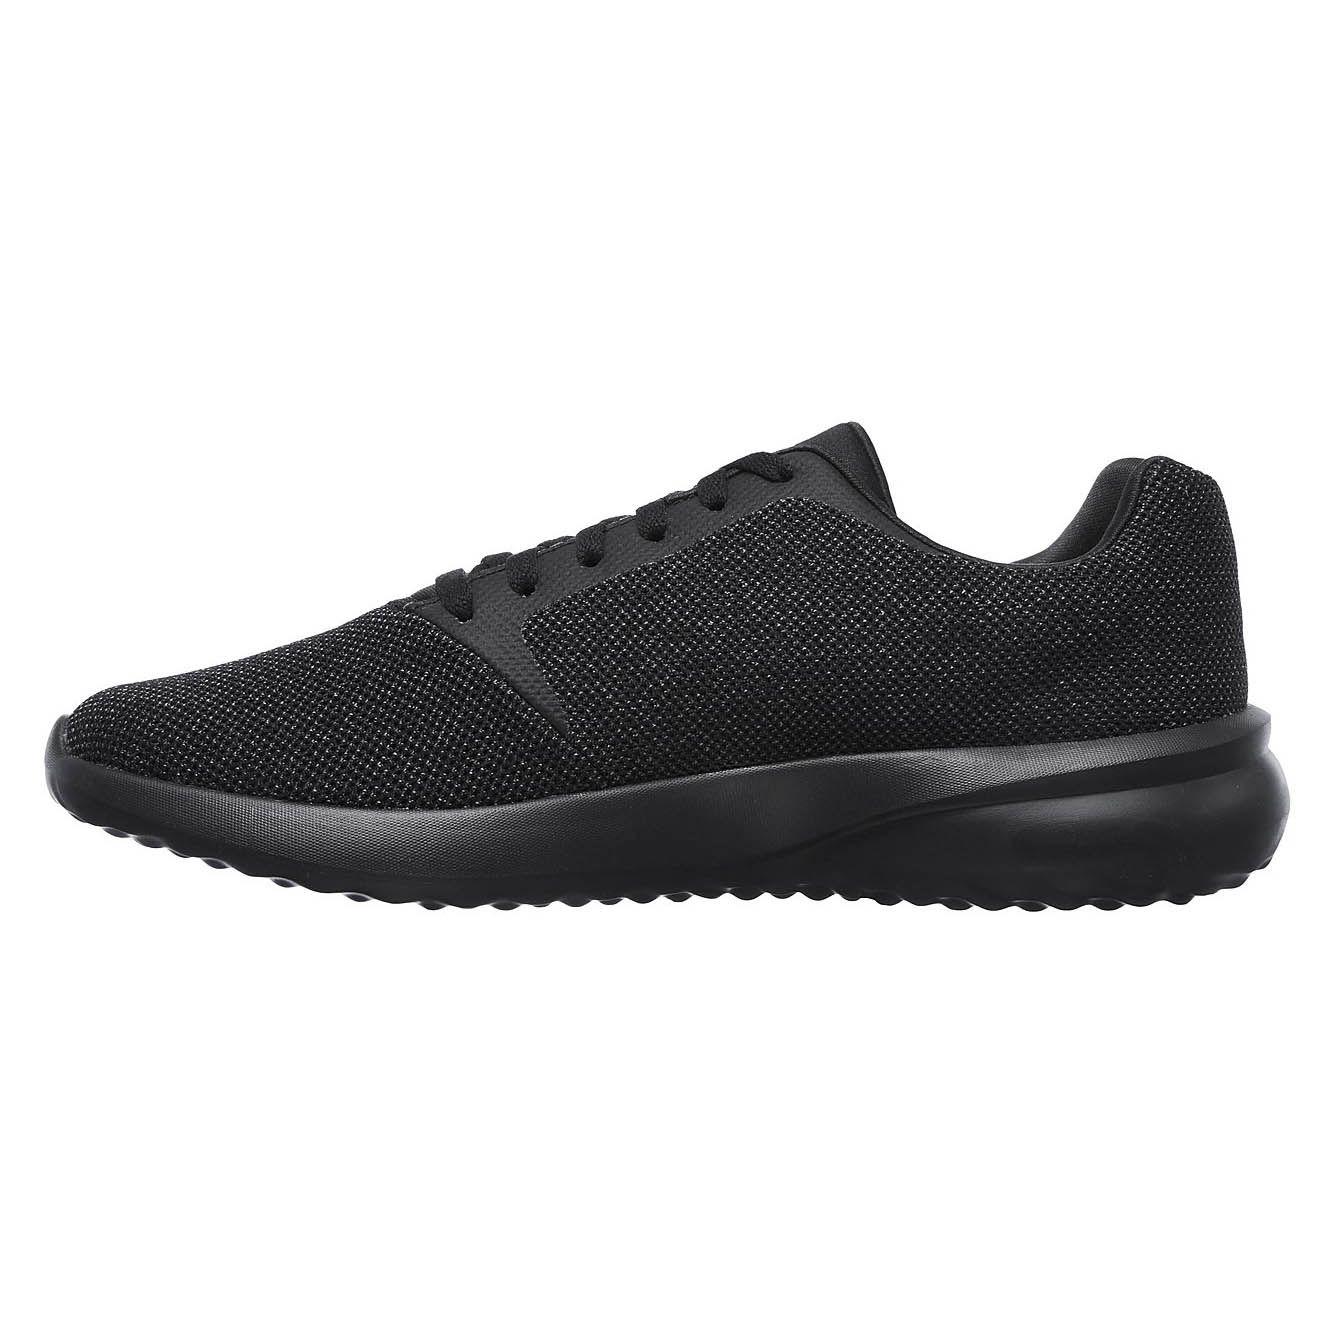 skechers on the go city 3 0 mens walking shoes. Black Bedroom Furniture Sets. Home Design Ideas